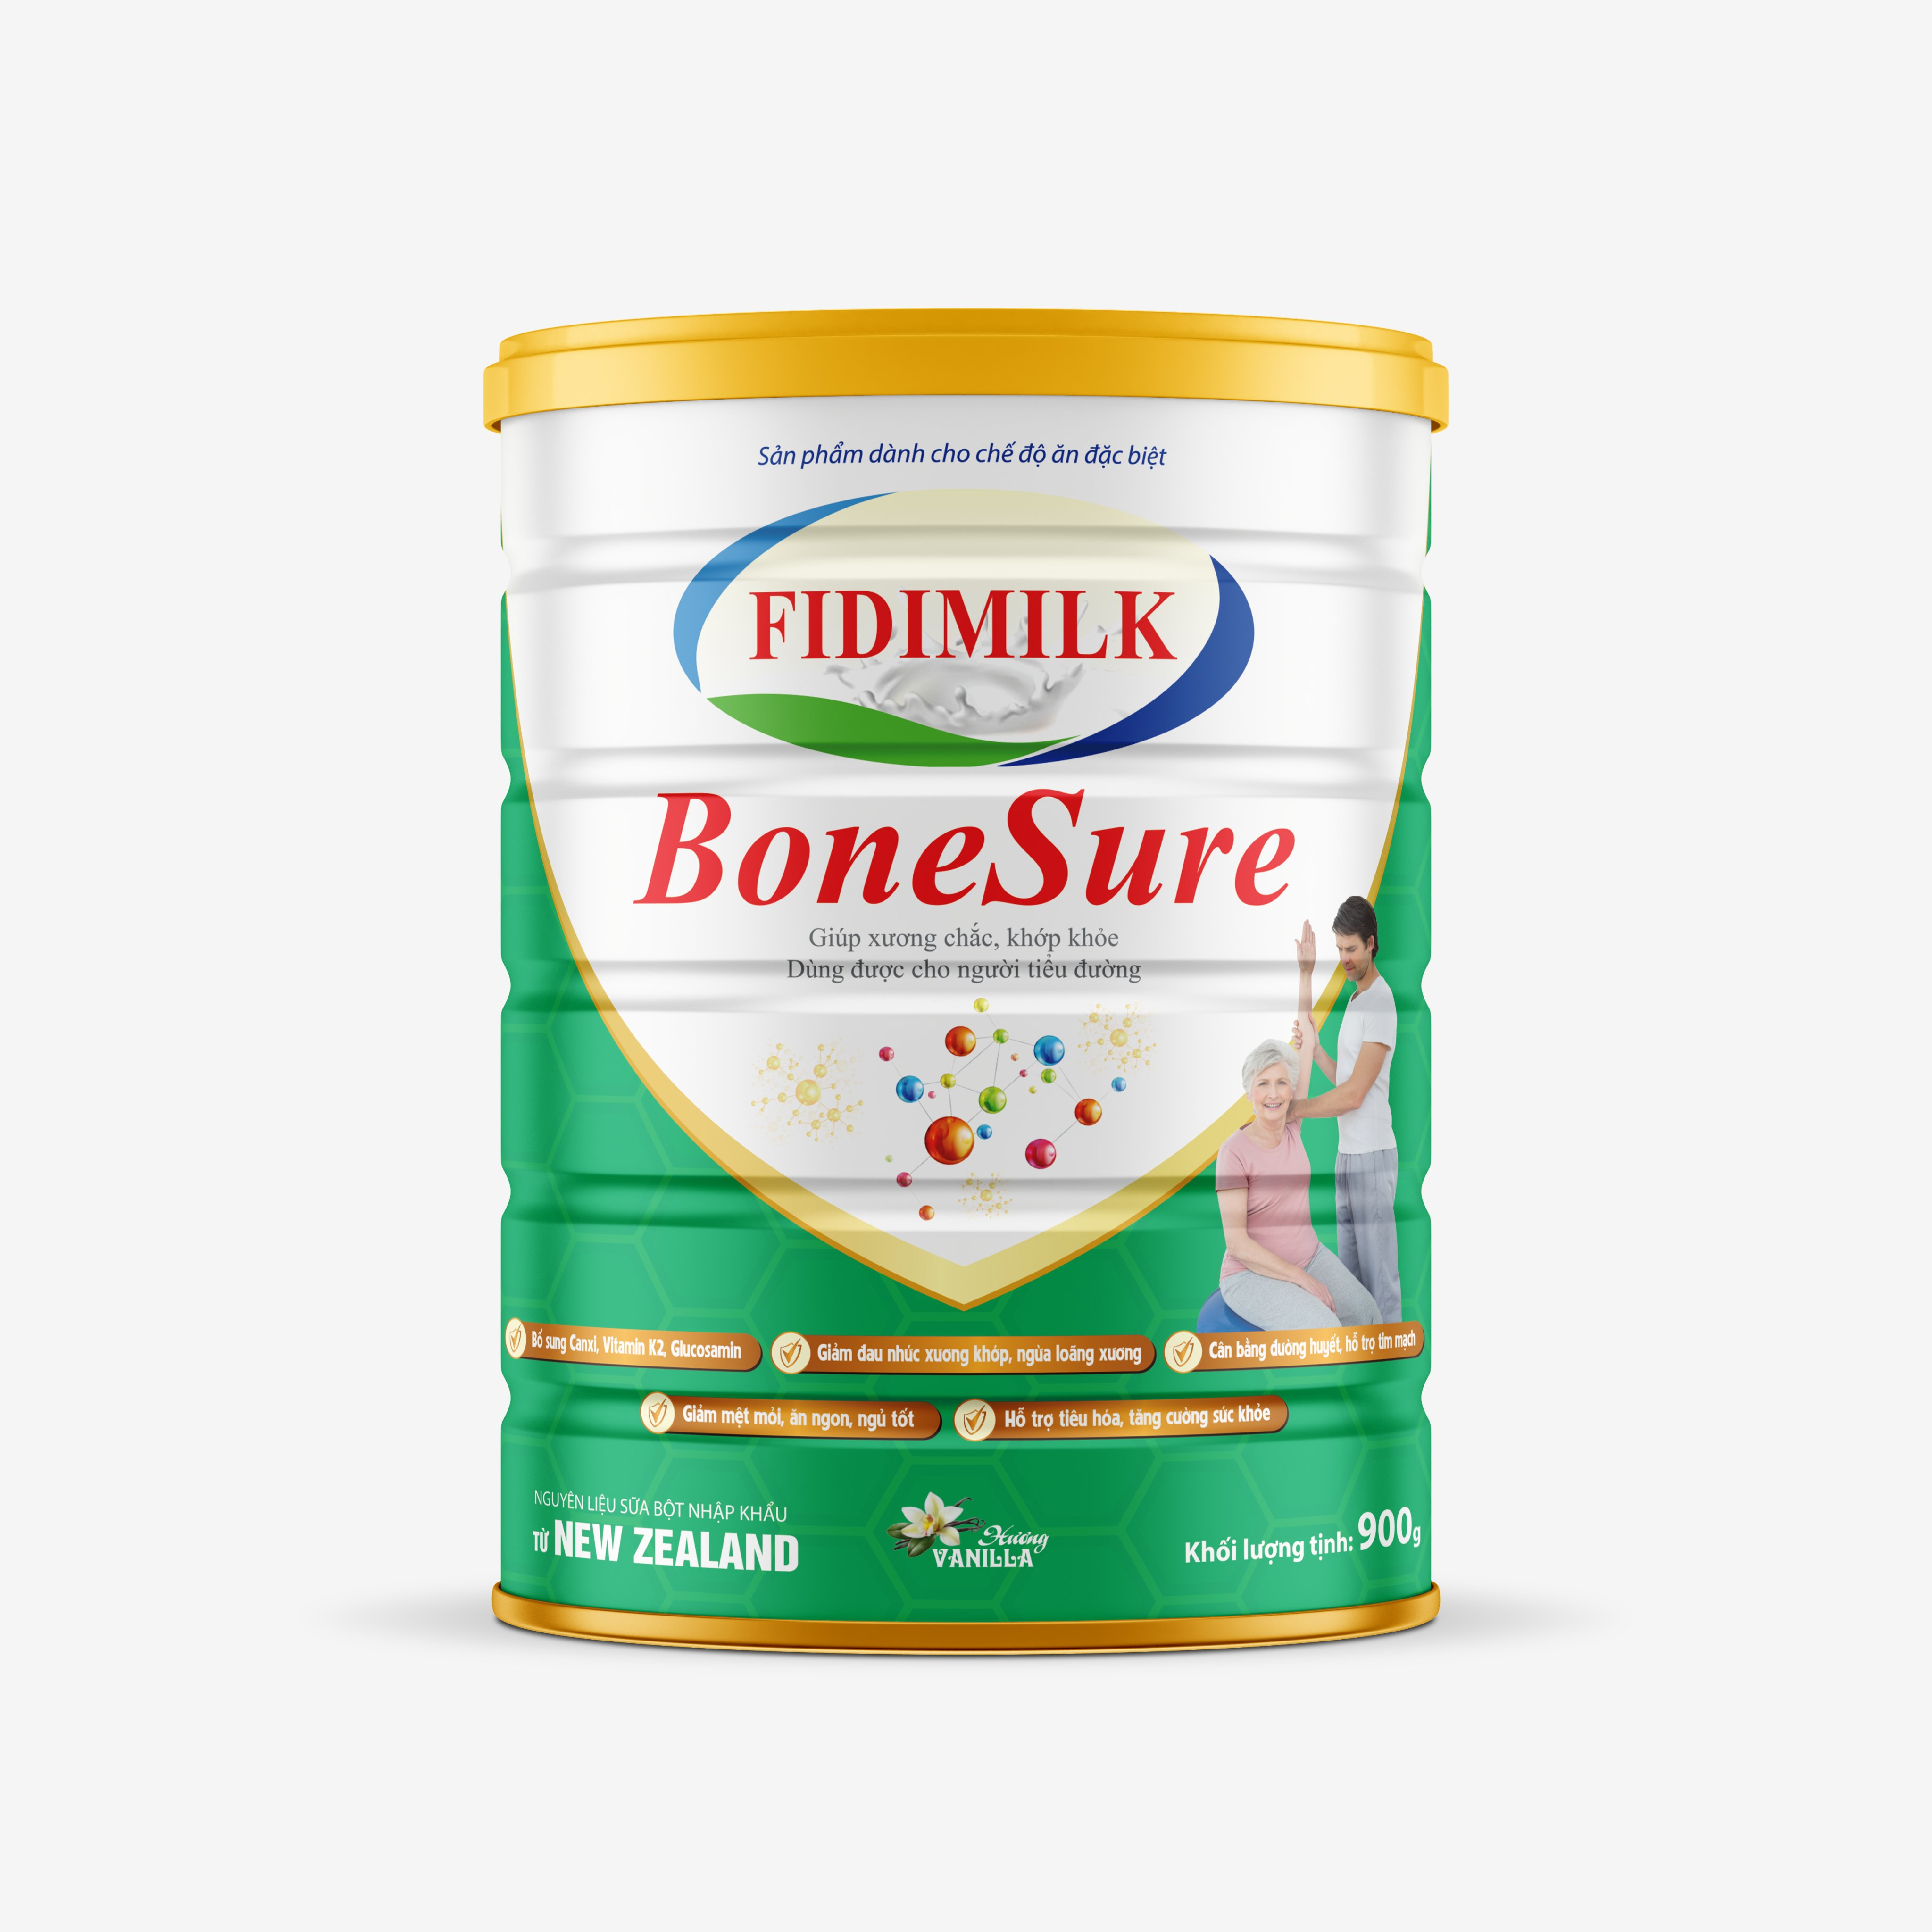 SỮA BỘT FIDIMILK BONESURE 900G